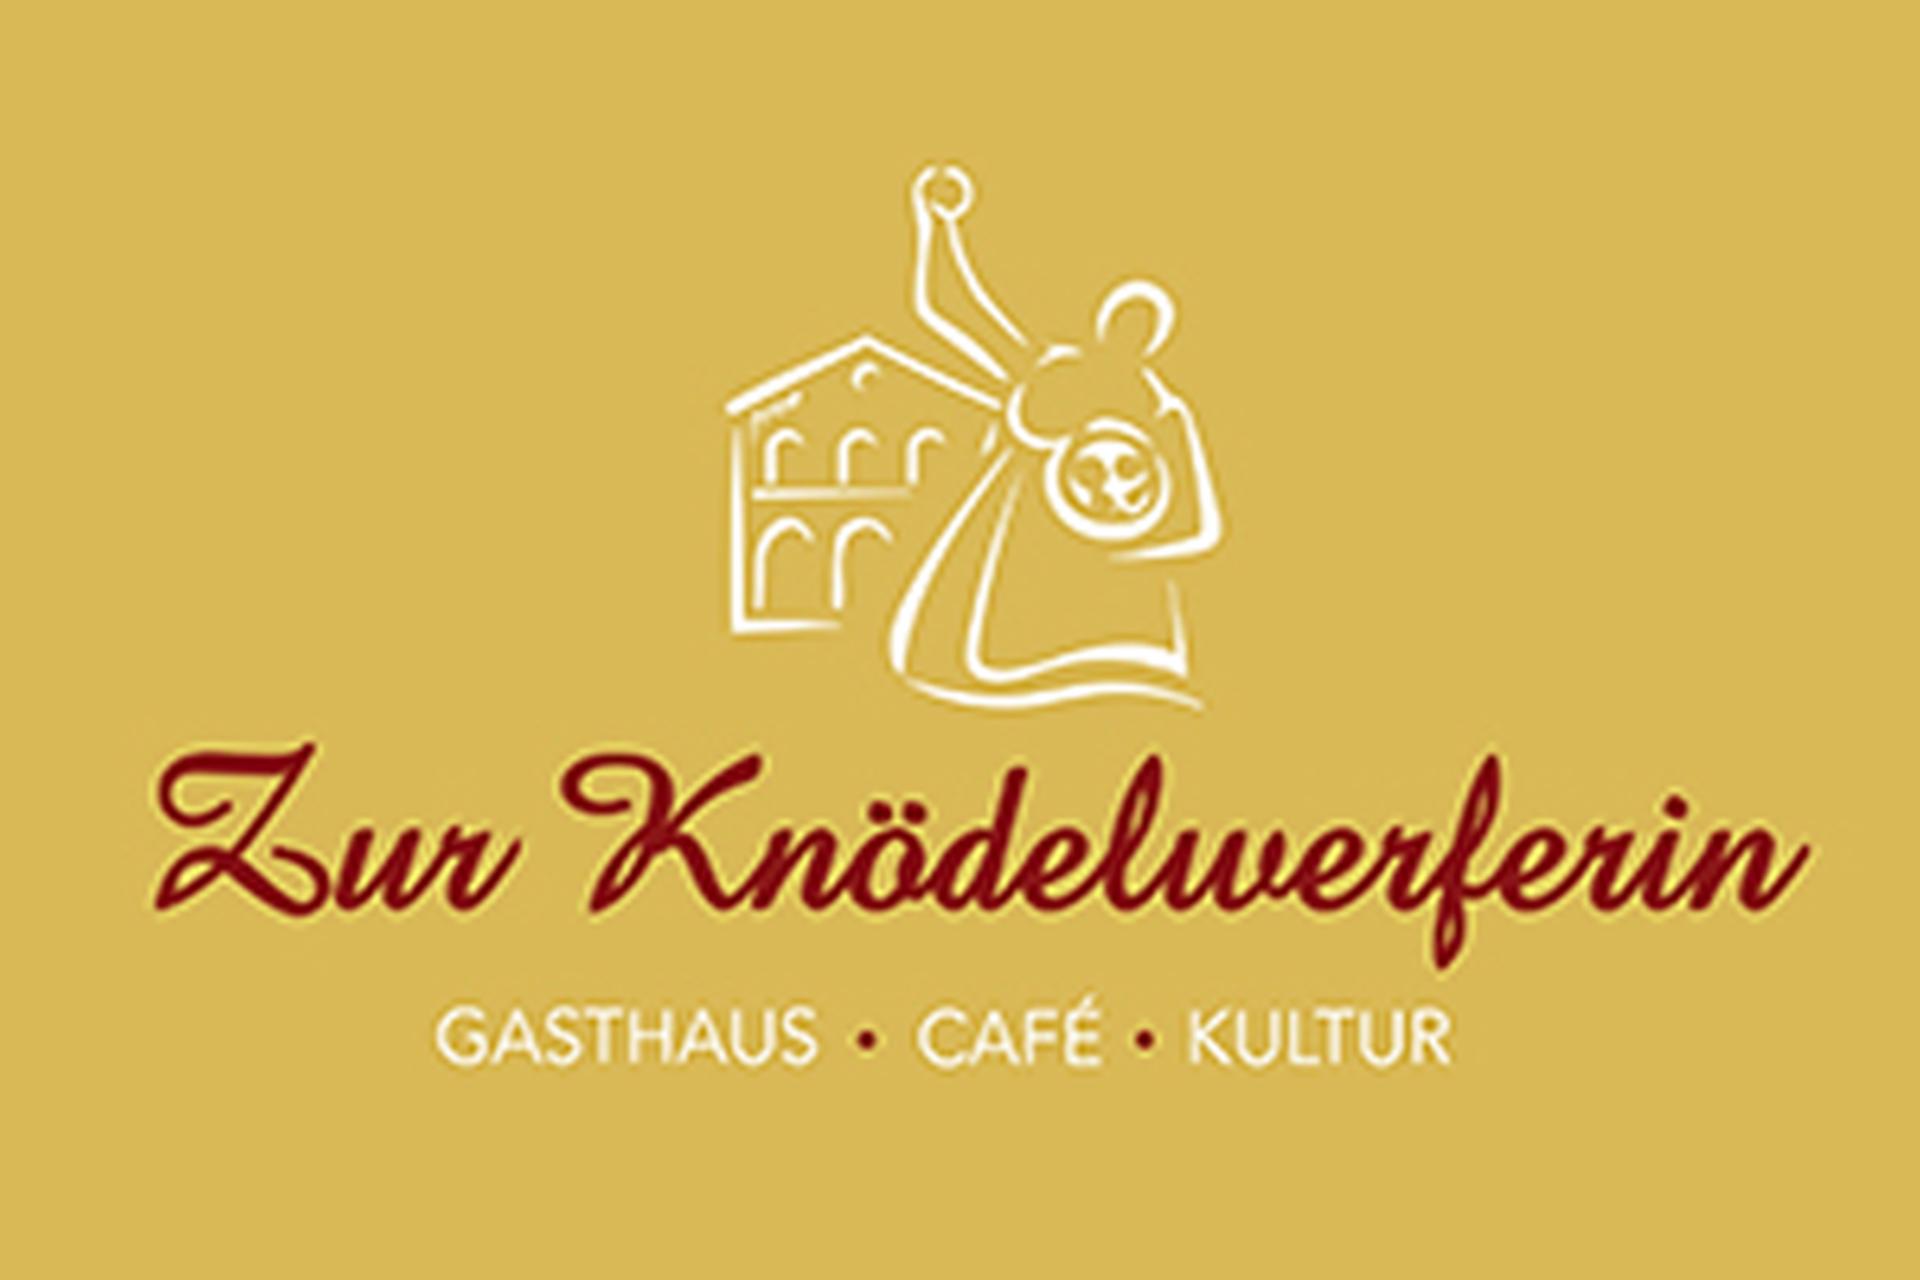 Logo café-bar kleines kameel